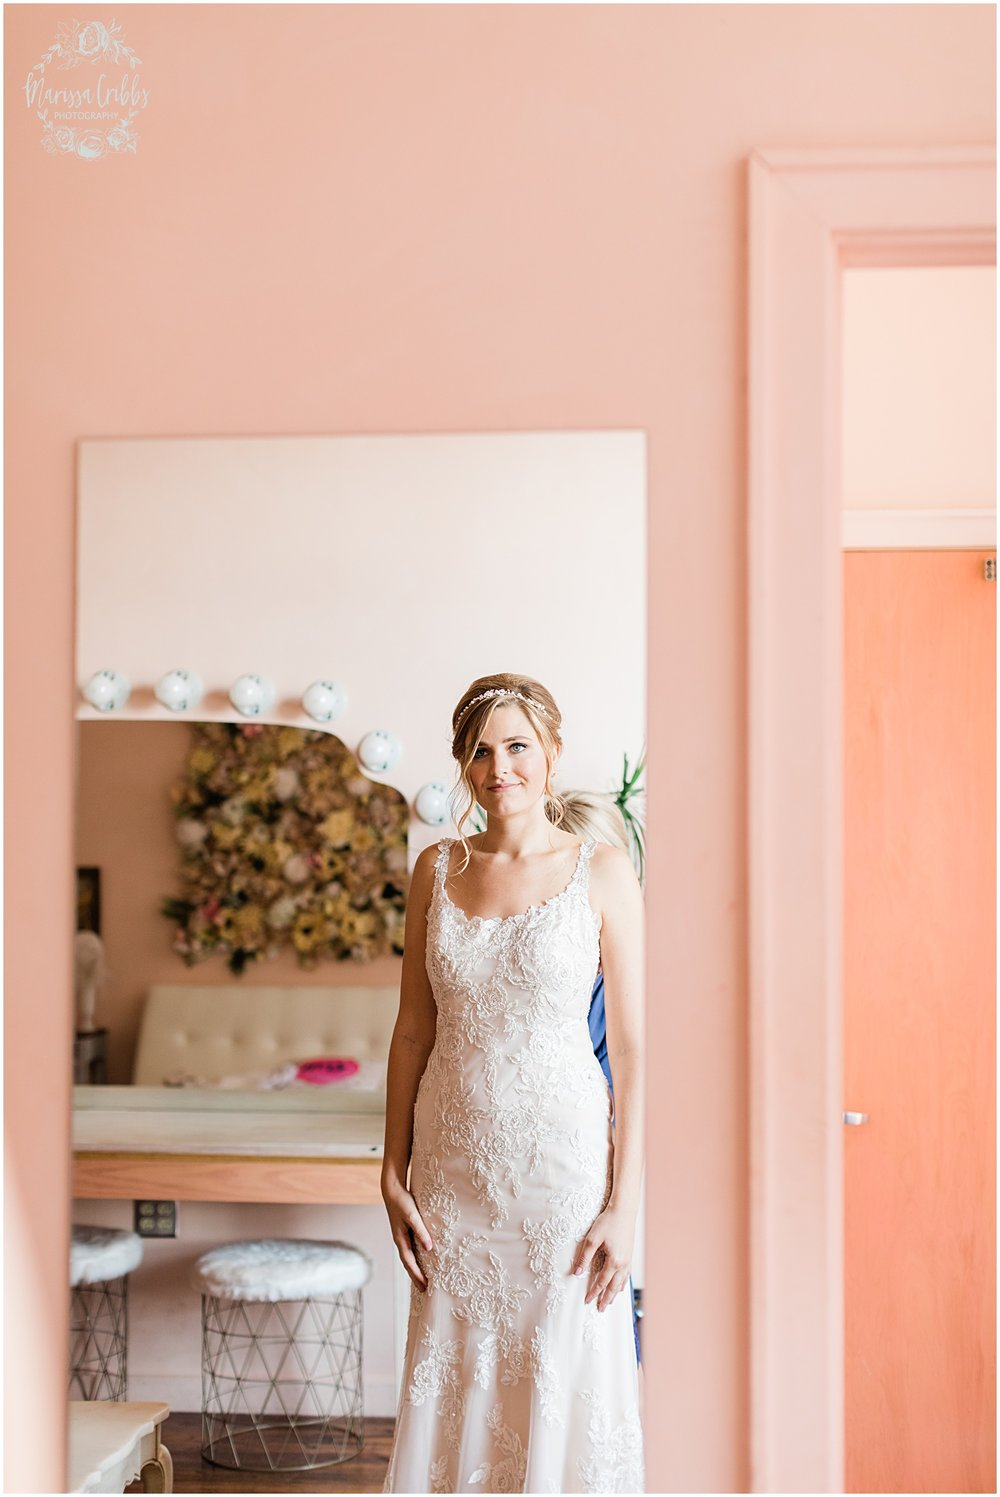 BAUER WEDDING   KELSEA & JUSTIN   MARISSA CRIBBS PHOTOGRAPHY_6495.jpg